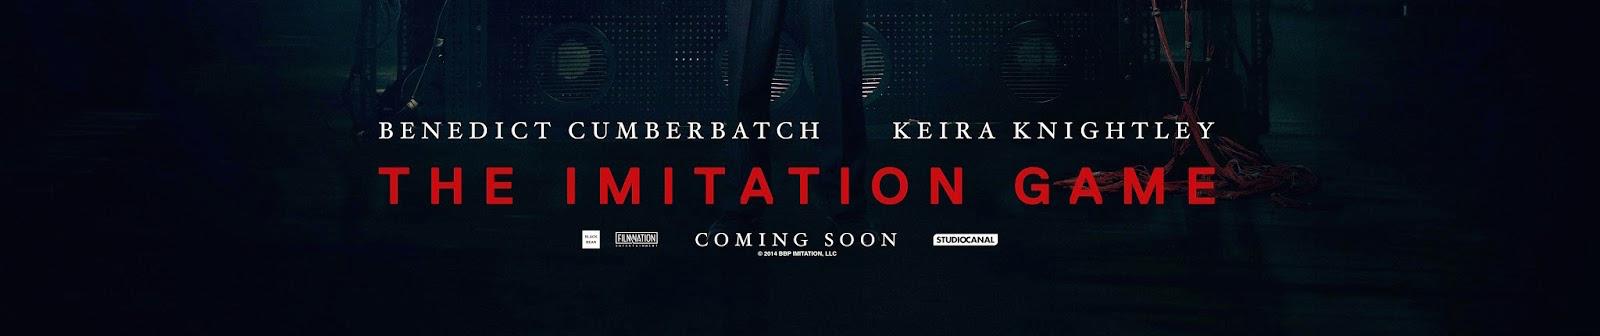 Imitation Game Recension GGGG+ (inkl video)